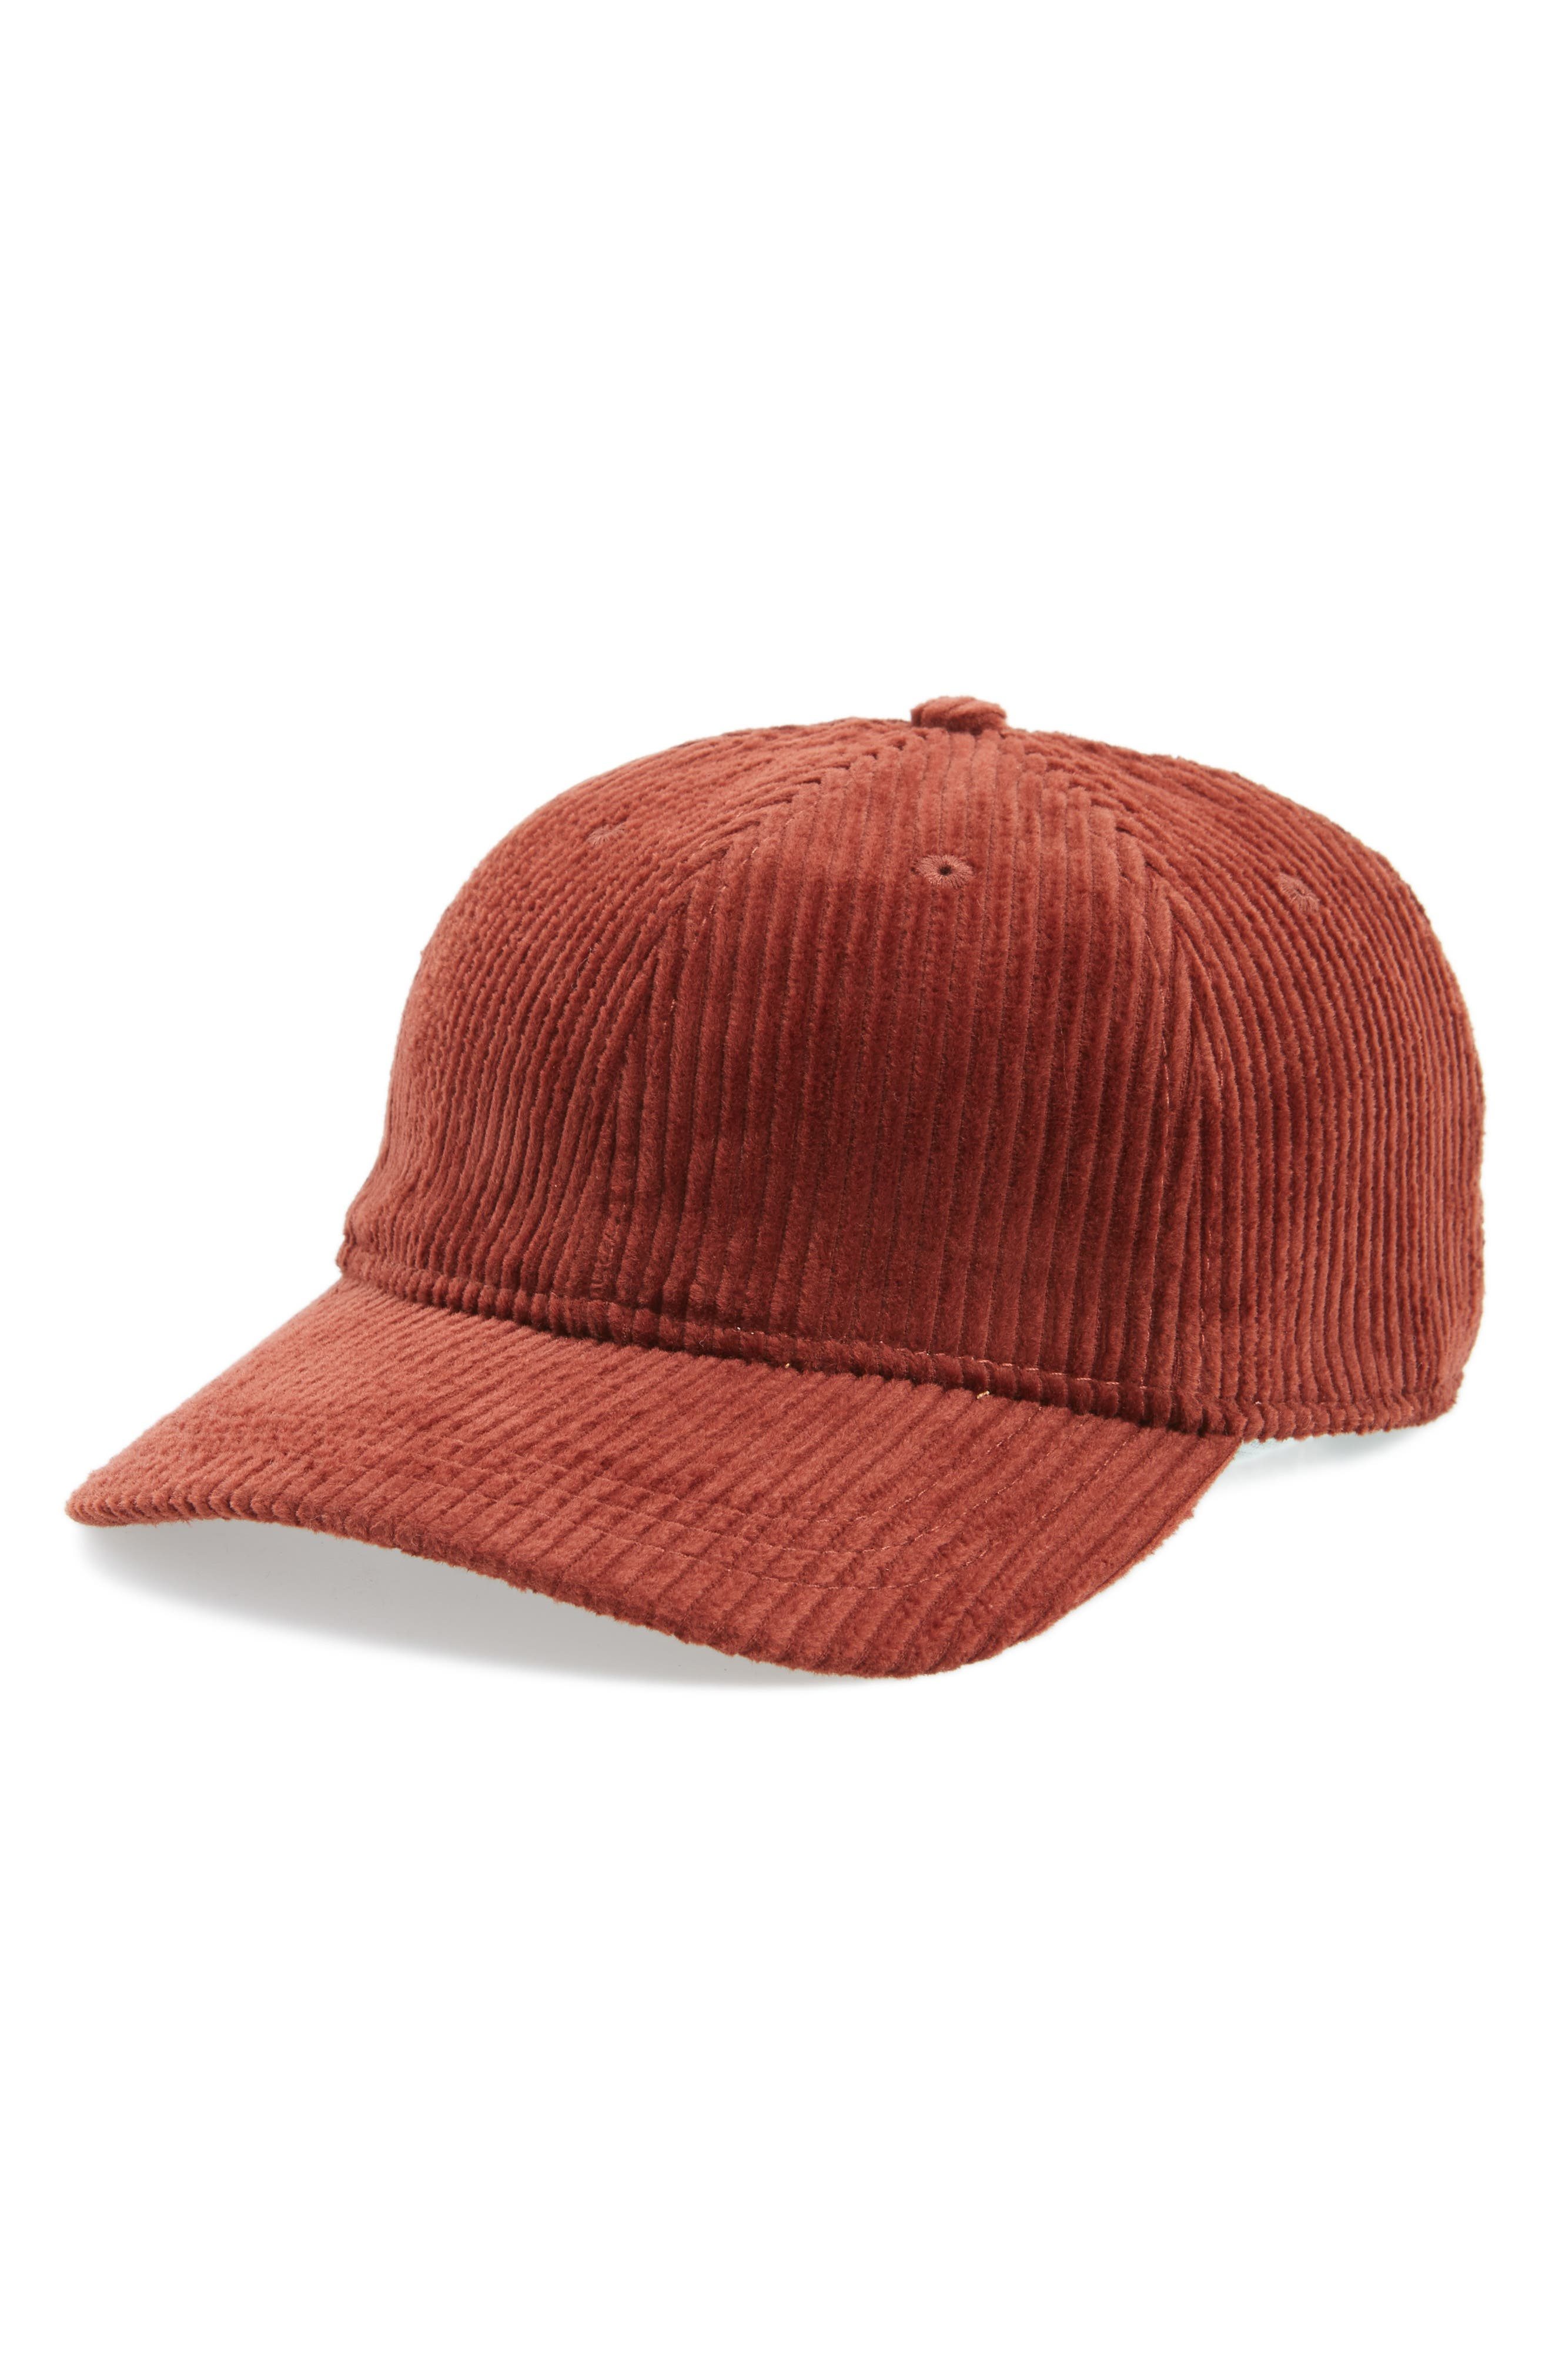 MADEWELL Corduroy Baseball Cap